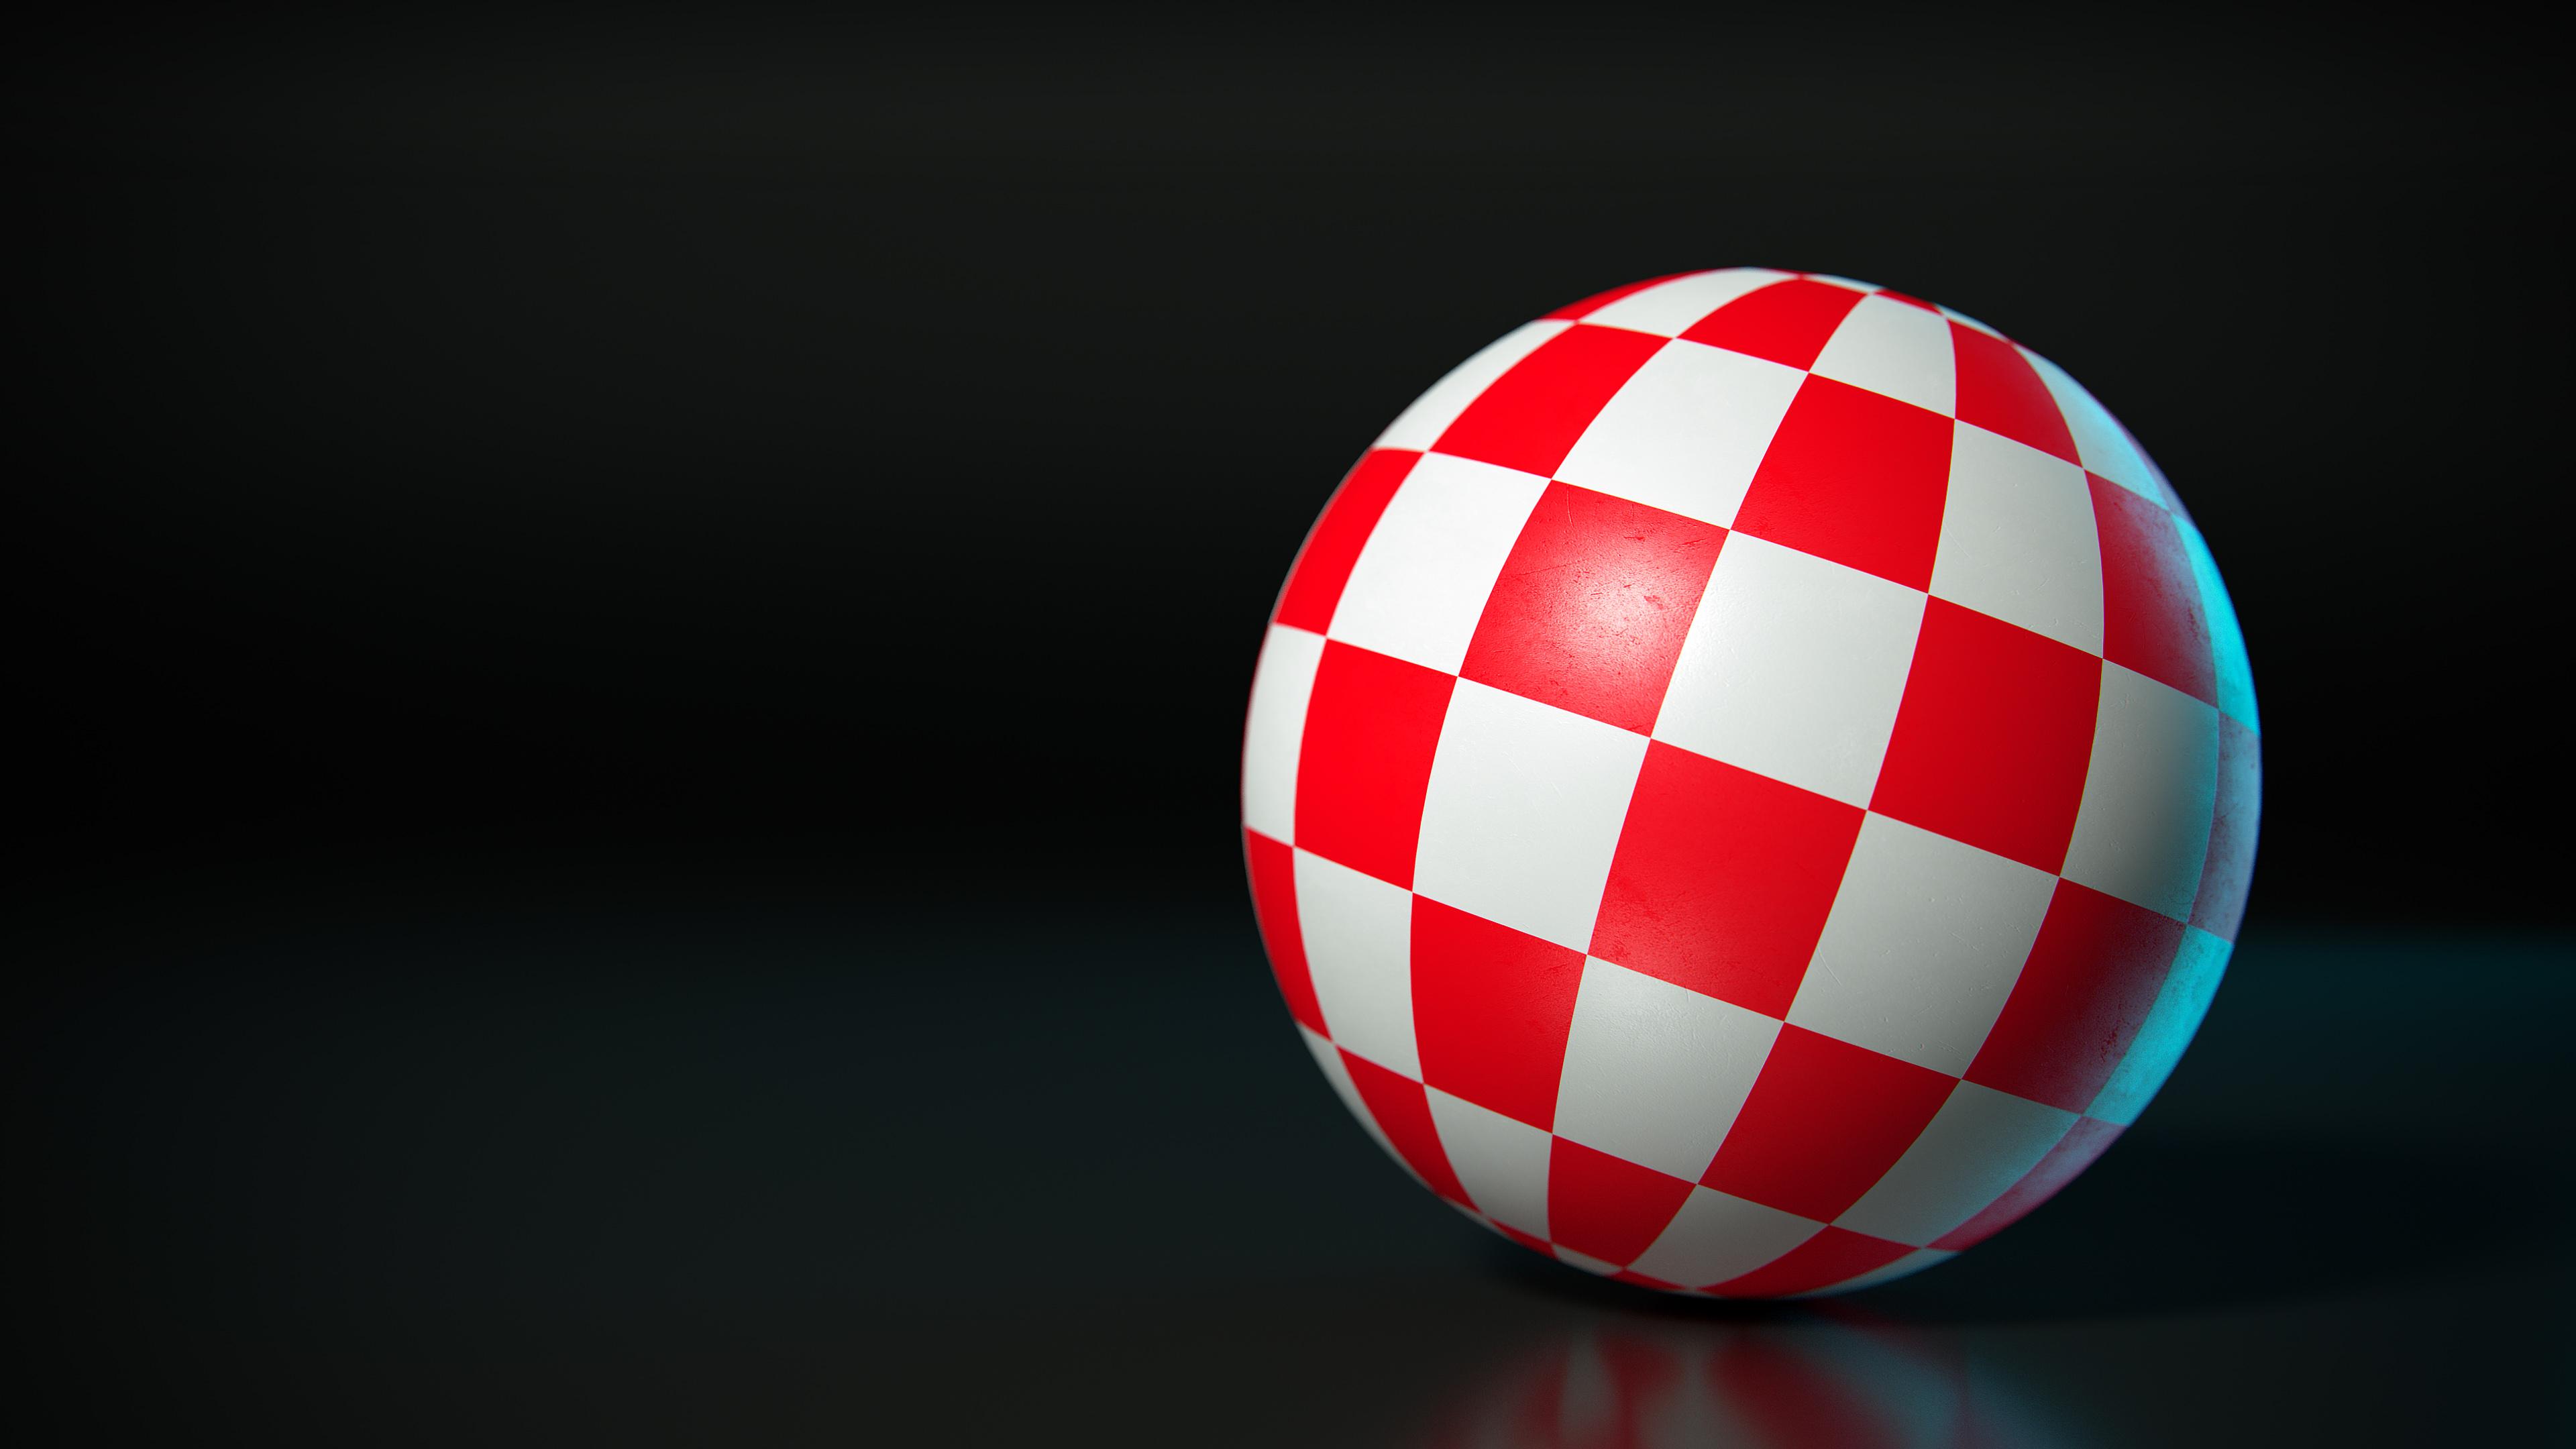 Amiga Boing Ball 4K wallpaper